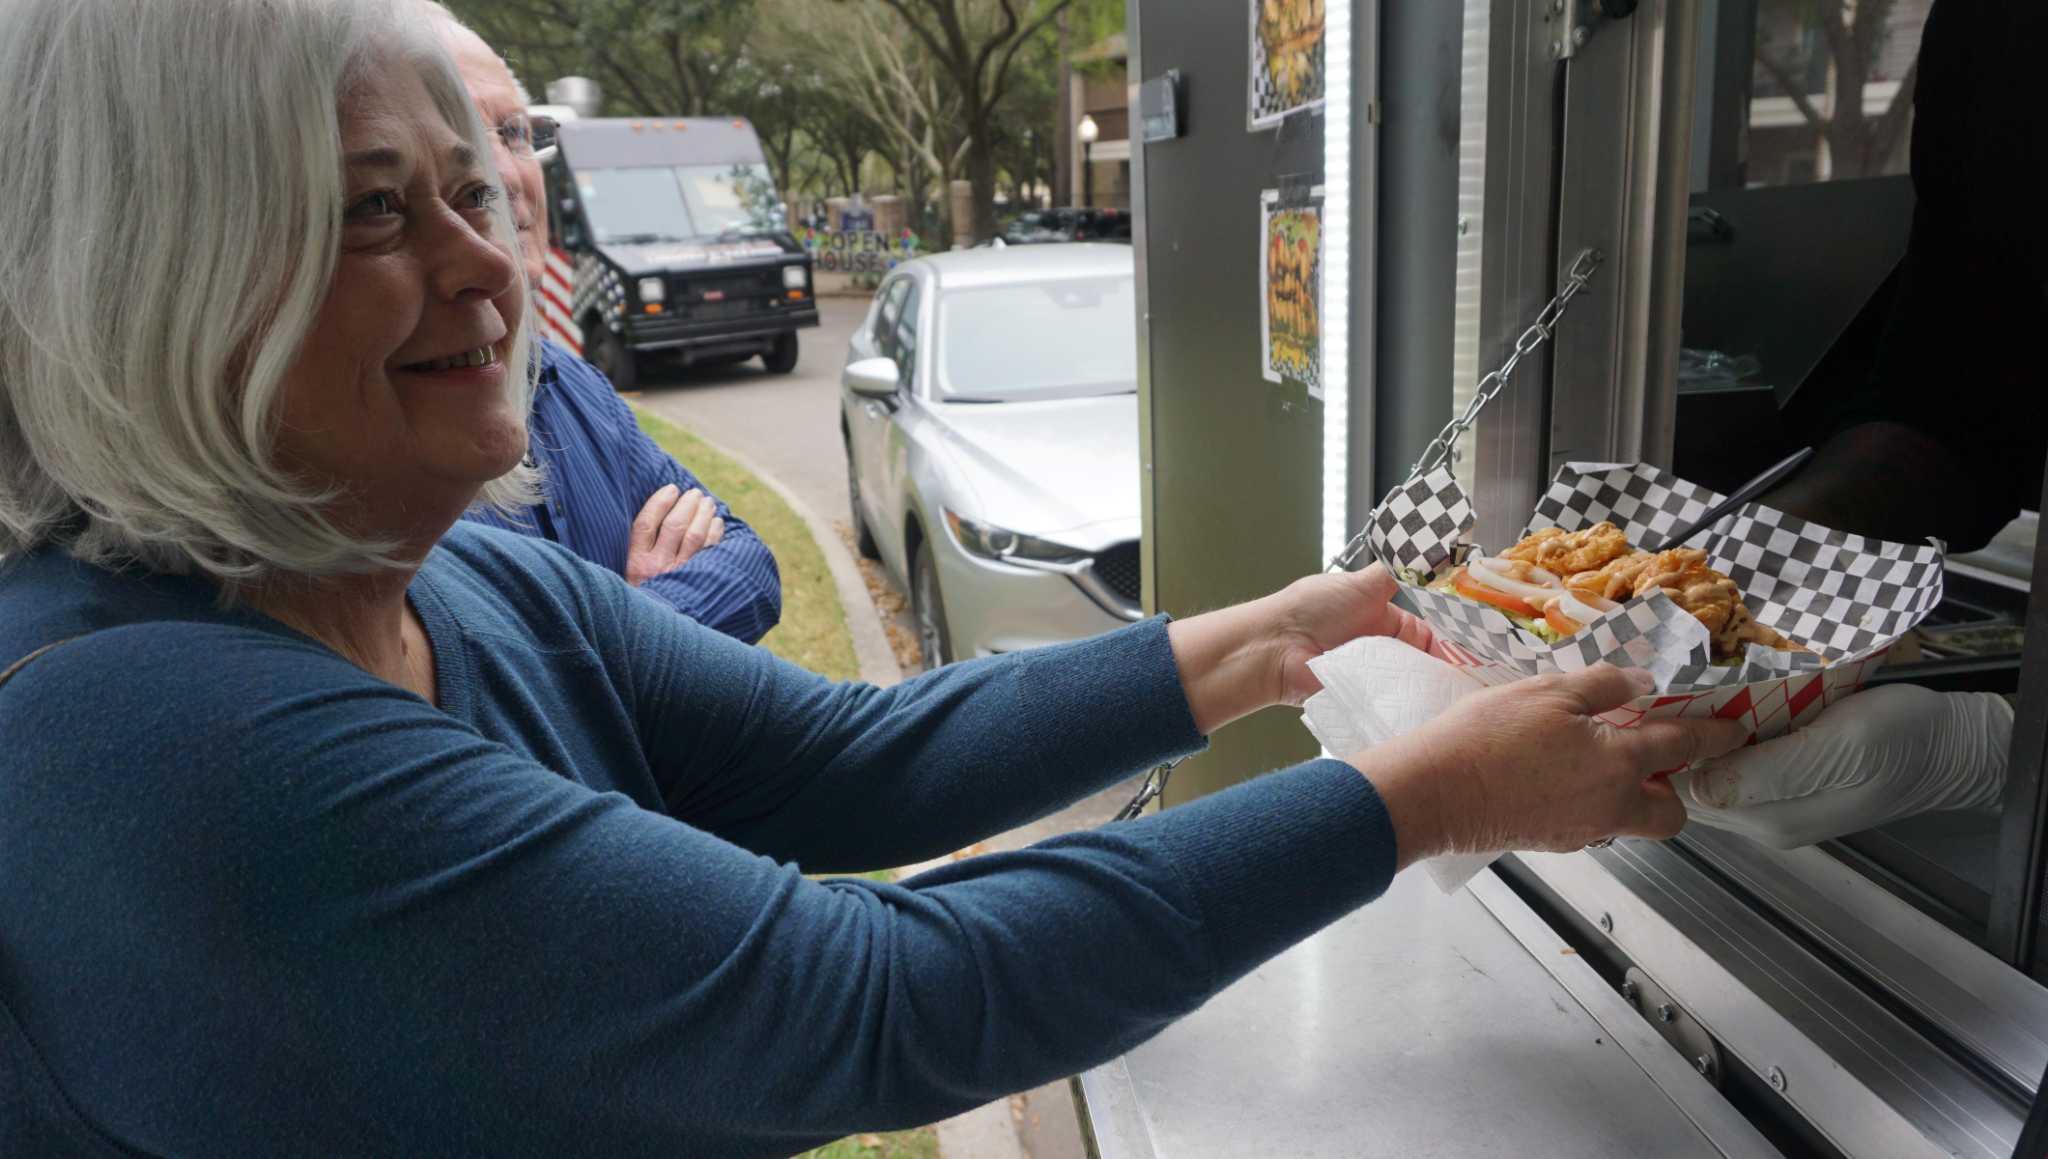 3rd Annual Spring Food Truck Festival enlivens Kingwood park with foods, goods